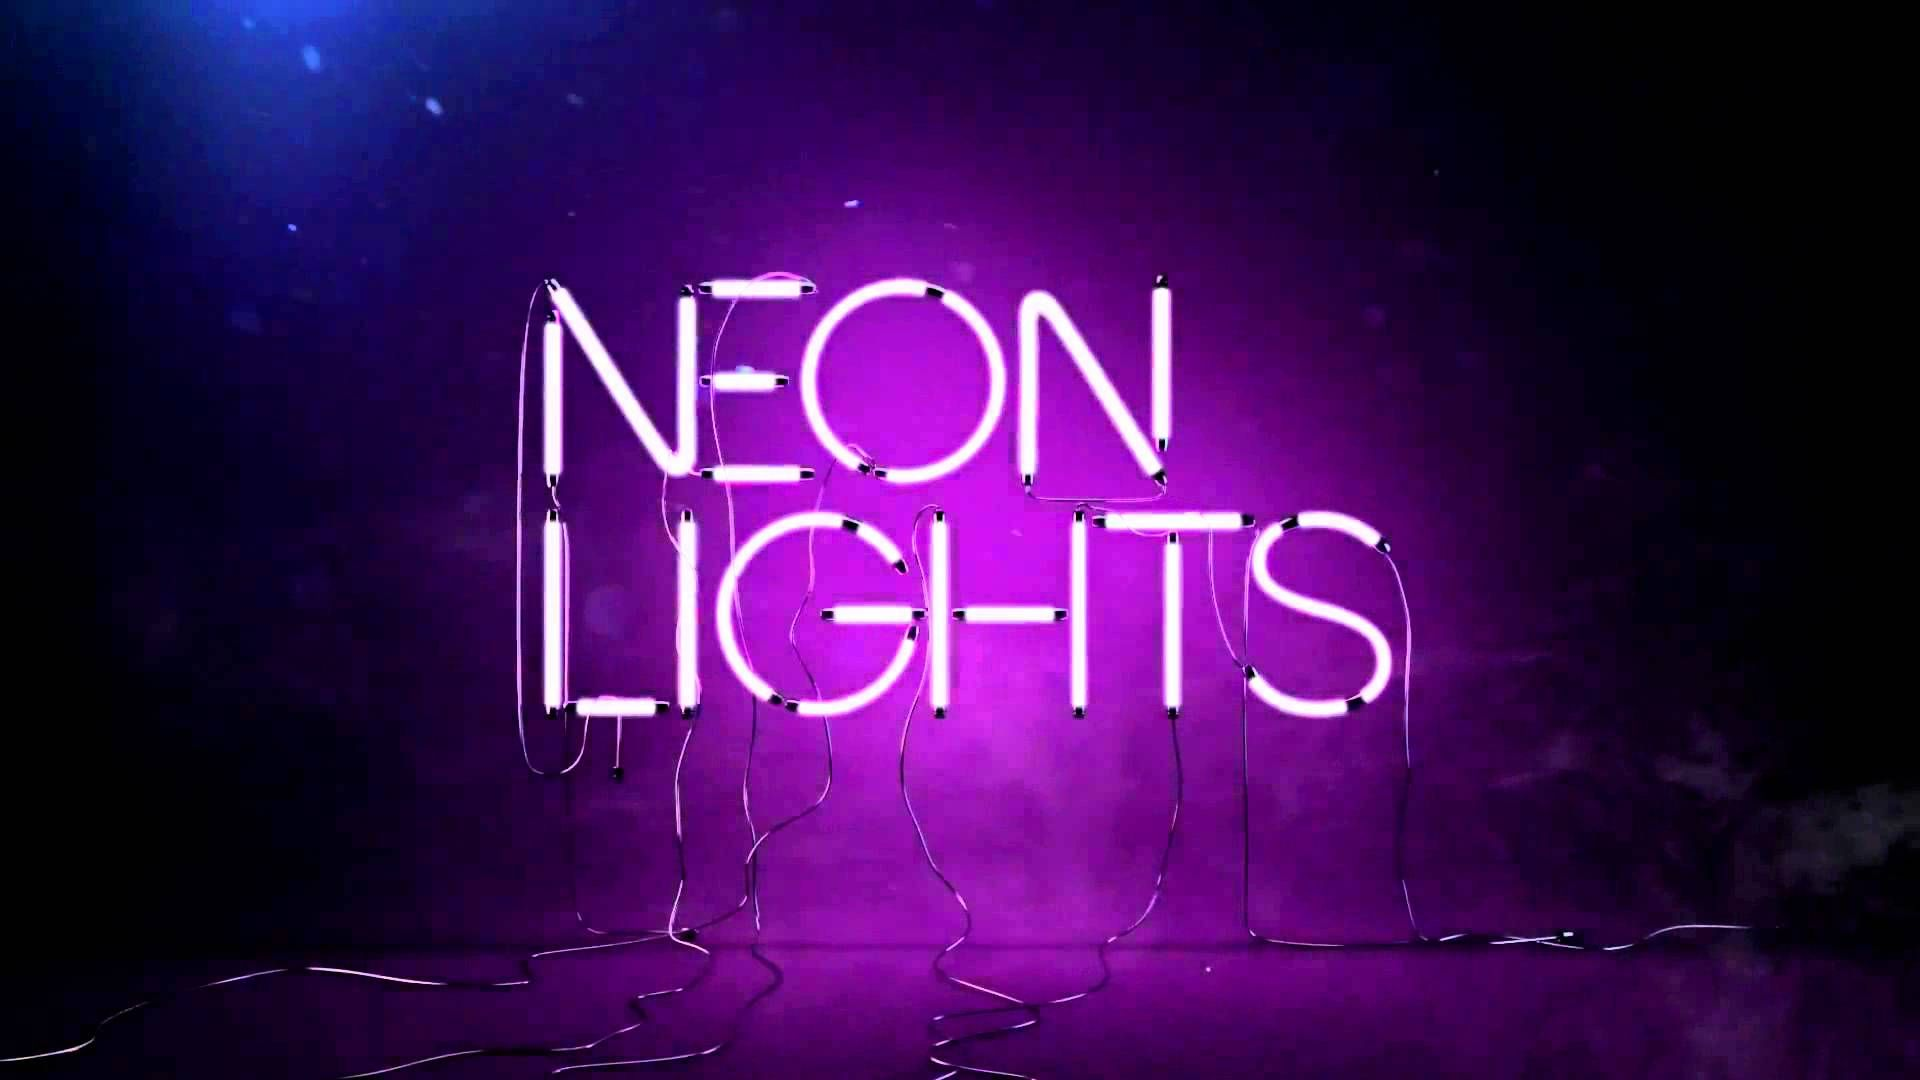 Demi Lovato Neon Lights Wallpaper Google Search Neon Light Wallpaper Neon Wallpaper Lit Wallpaper